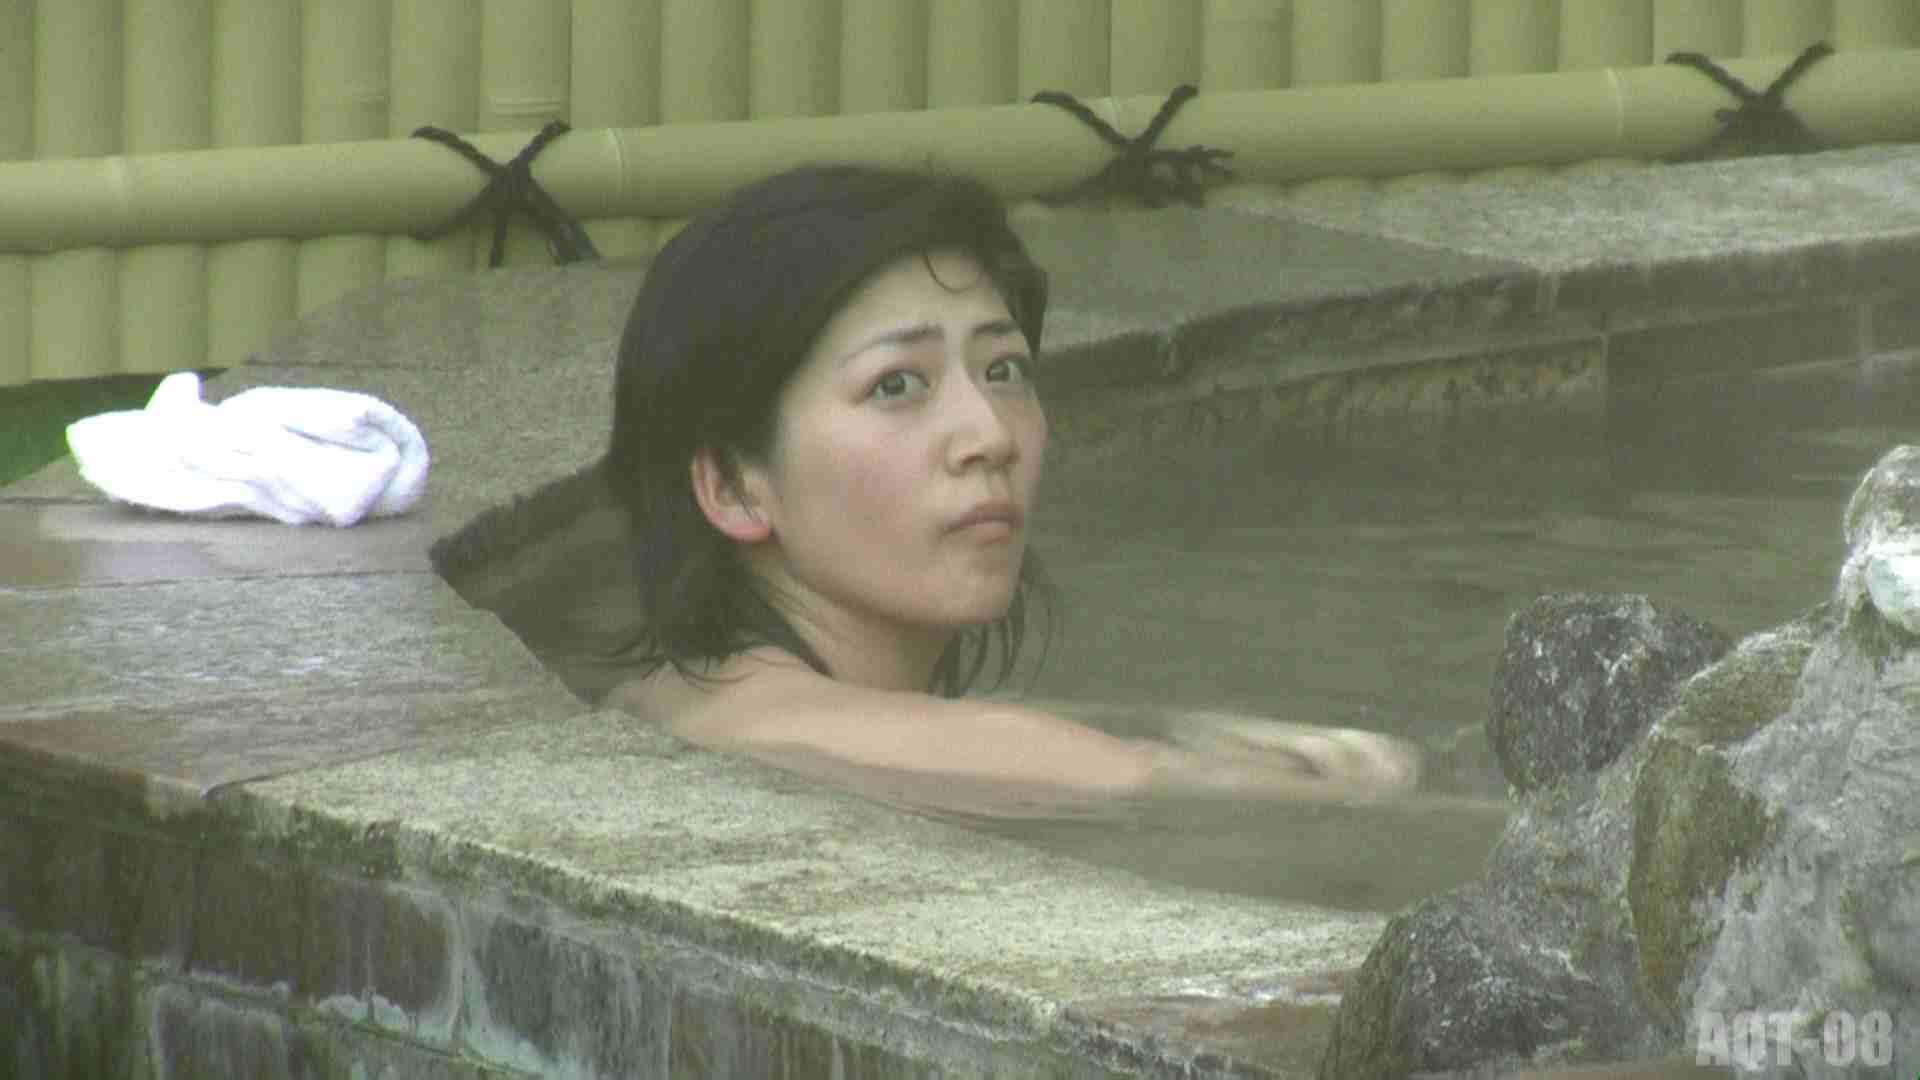 Aquaな露天風呂Vol.776 盗撮 | HなOL  60pic 40